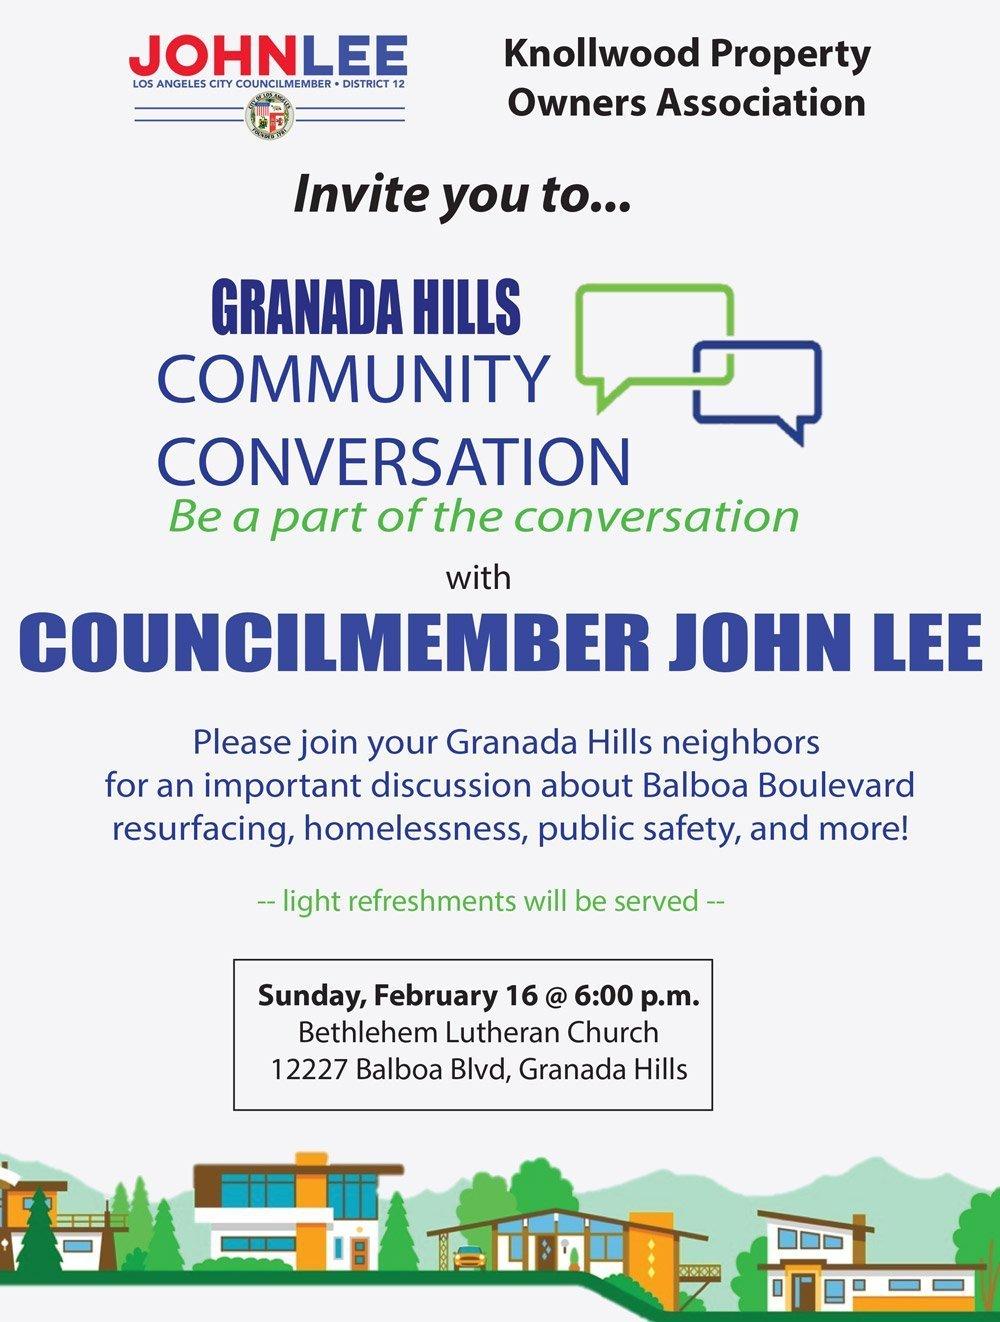 Granada Hills Community Conversation with Councilmember John Lee – Sunday, February 16